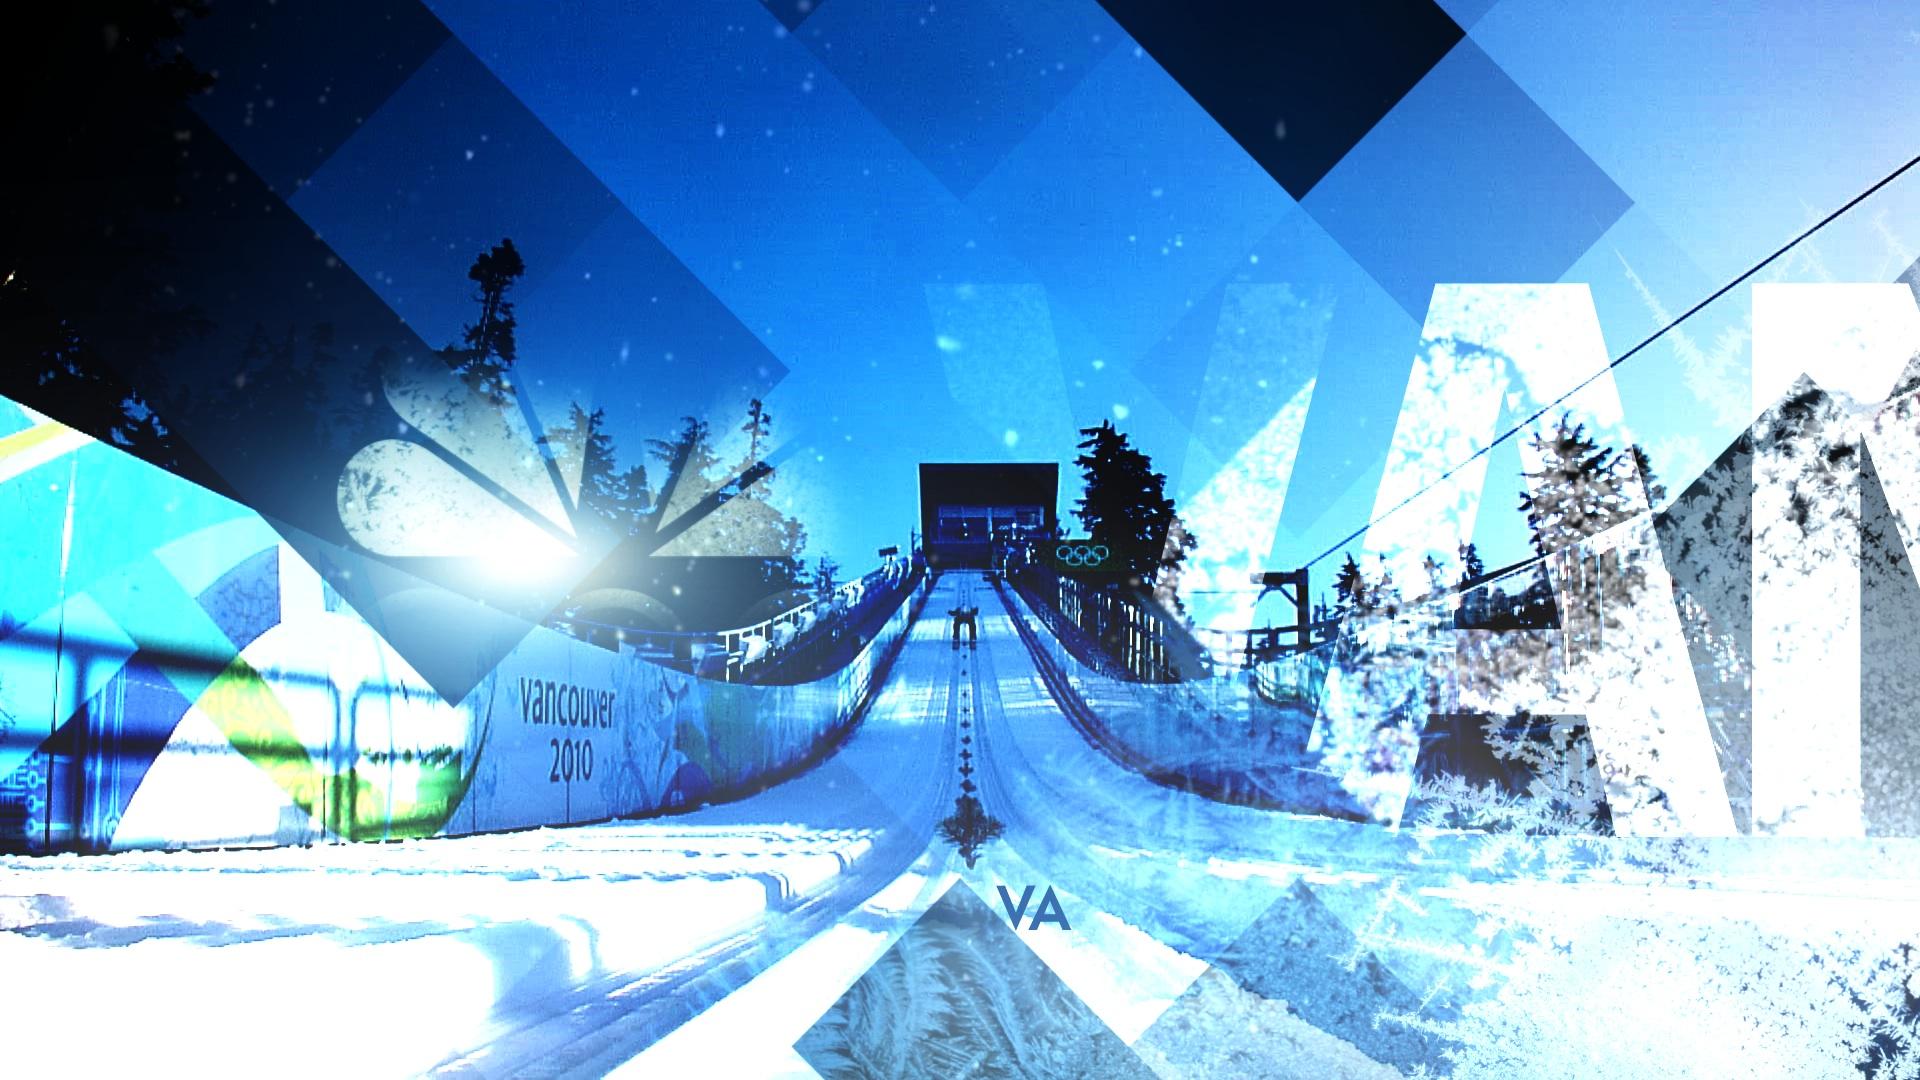 XXI OLYMPIC WINTER GAMES - NBC SPORTS & OLYMPICS